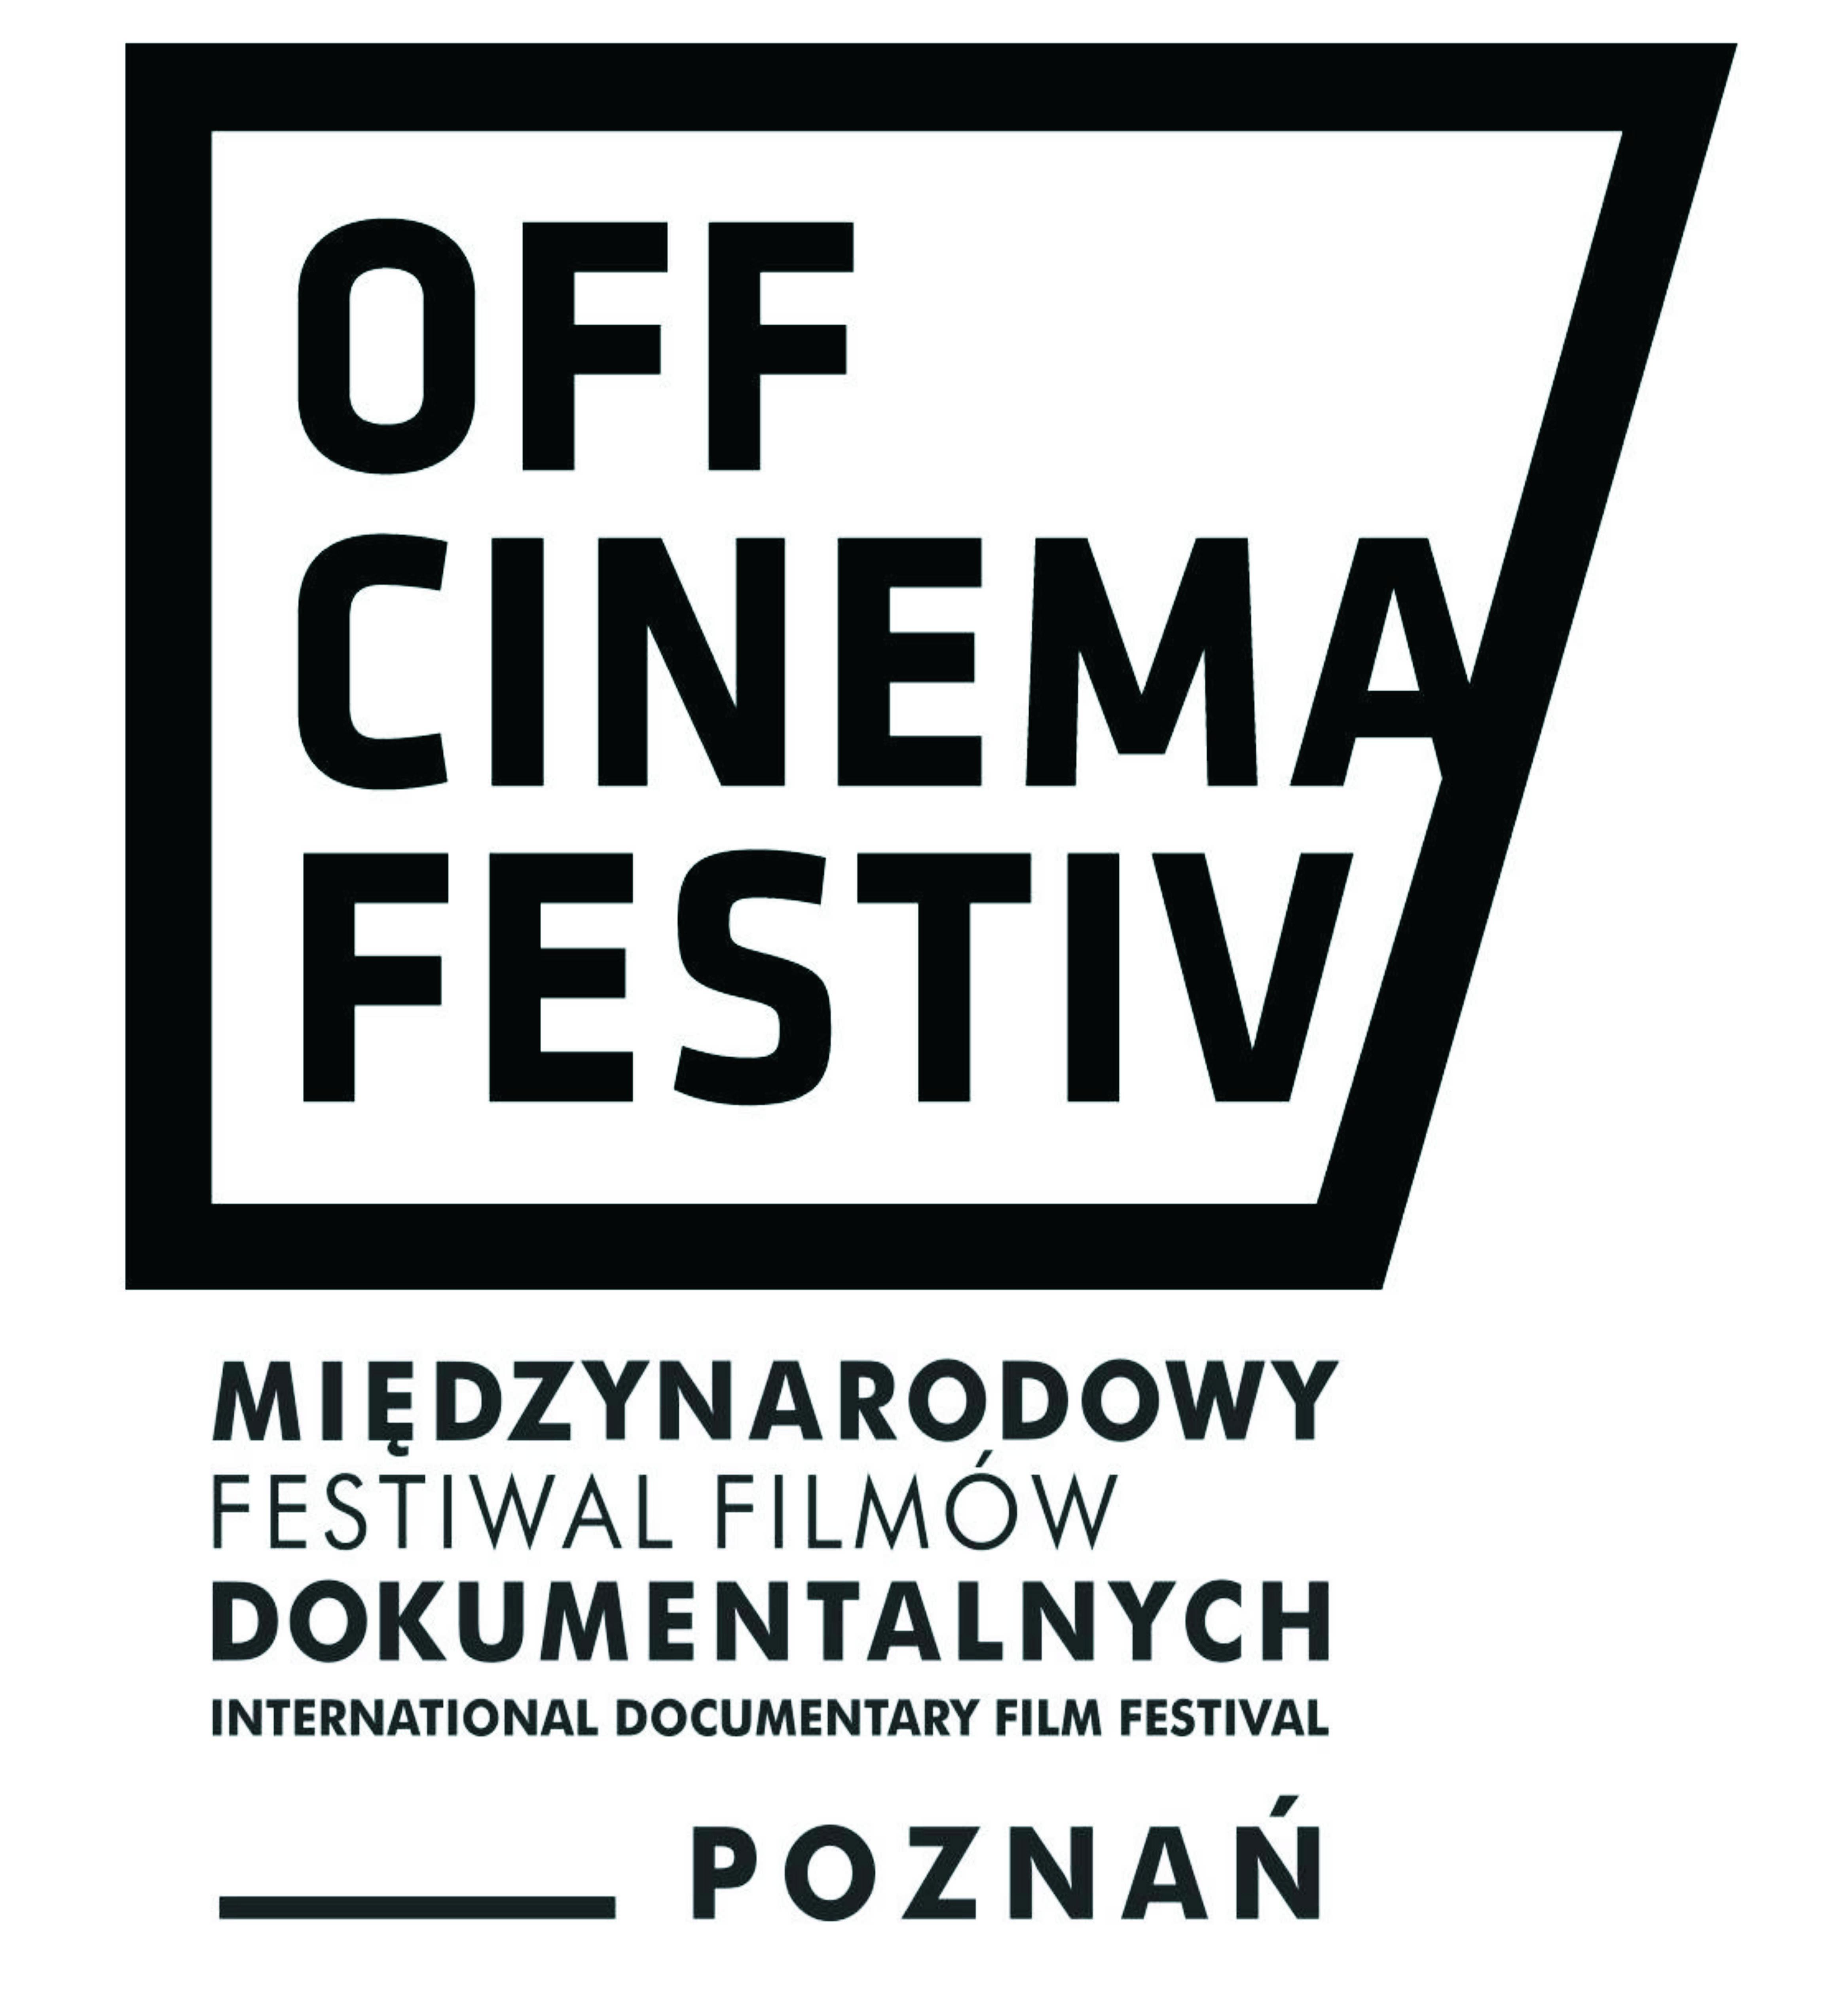 OFF CINEMA 2020: Blok konkursowy 11 - Mój kraj Polska